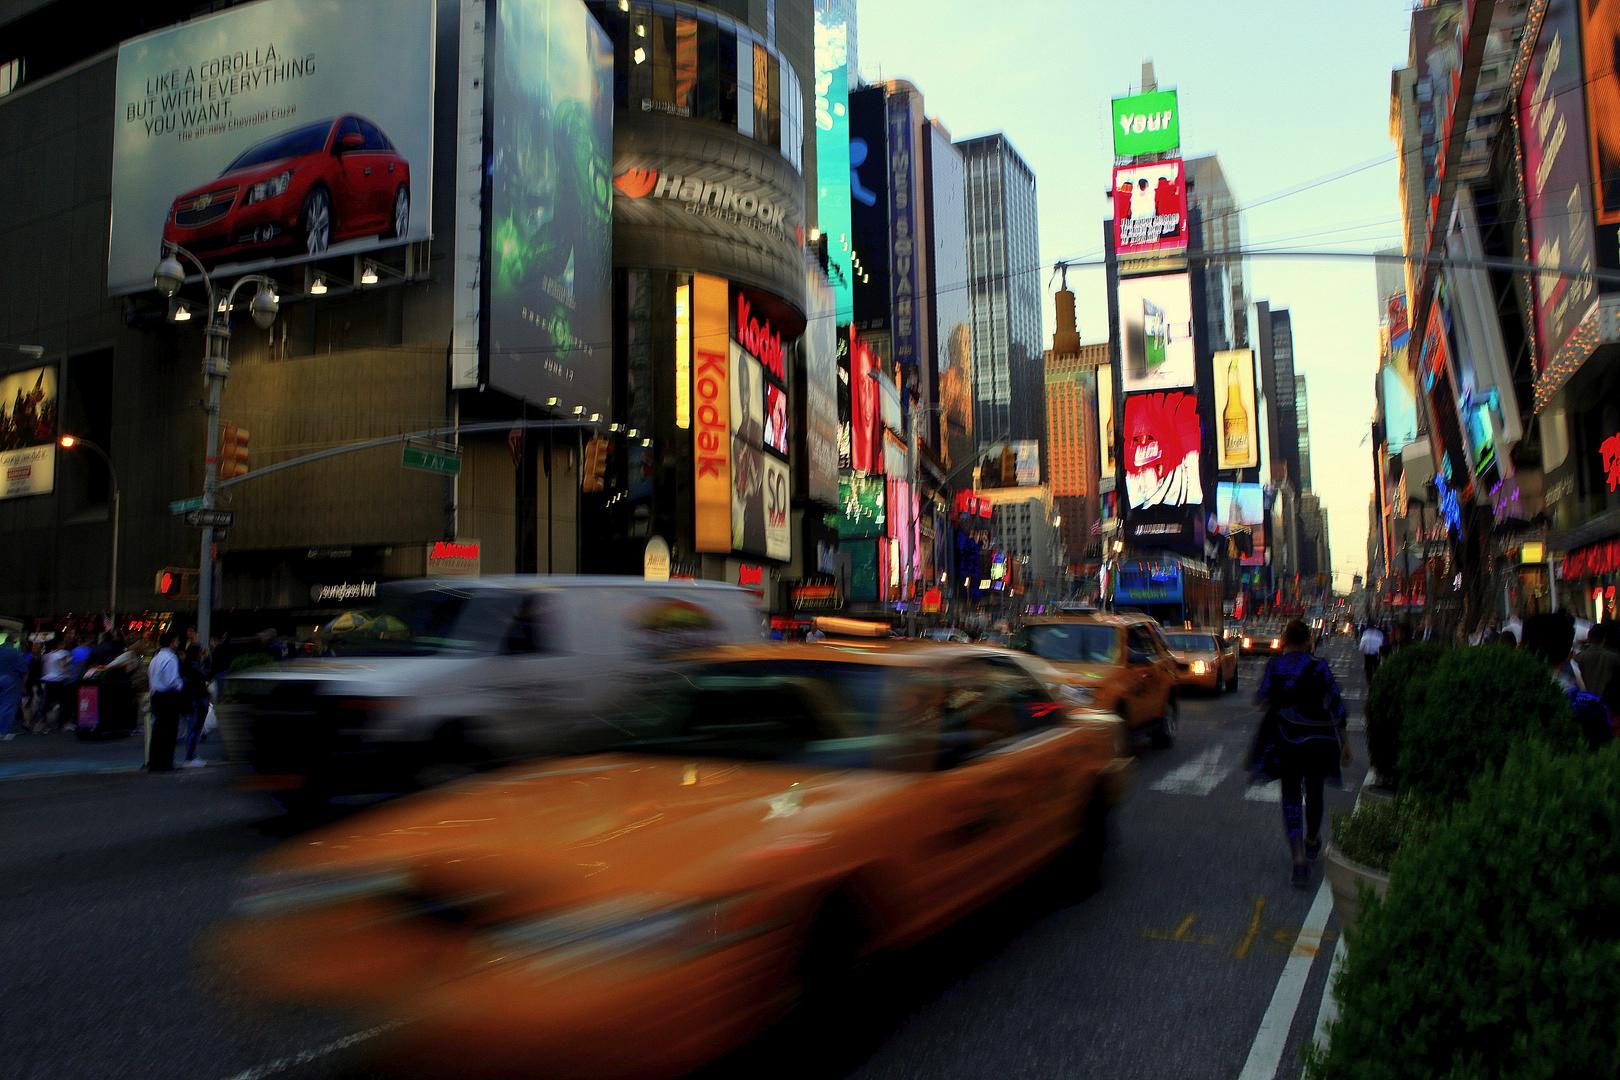 walking in New York City